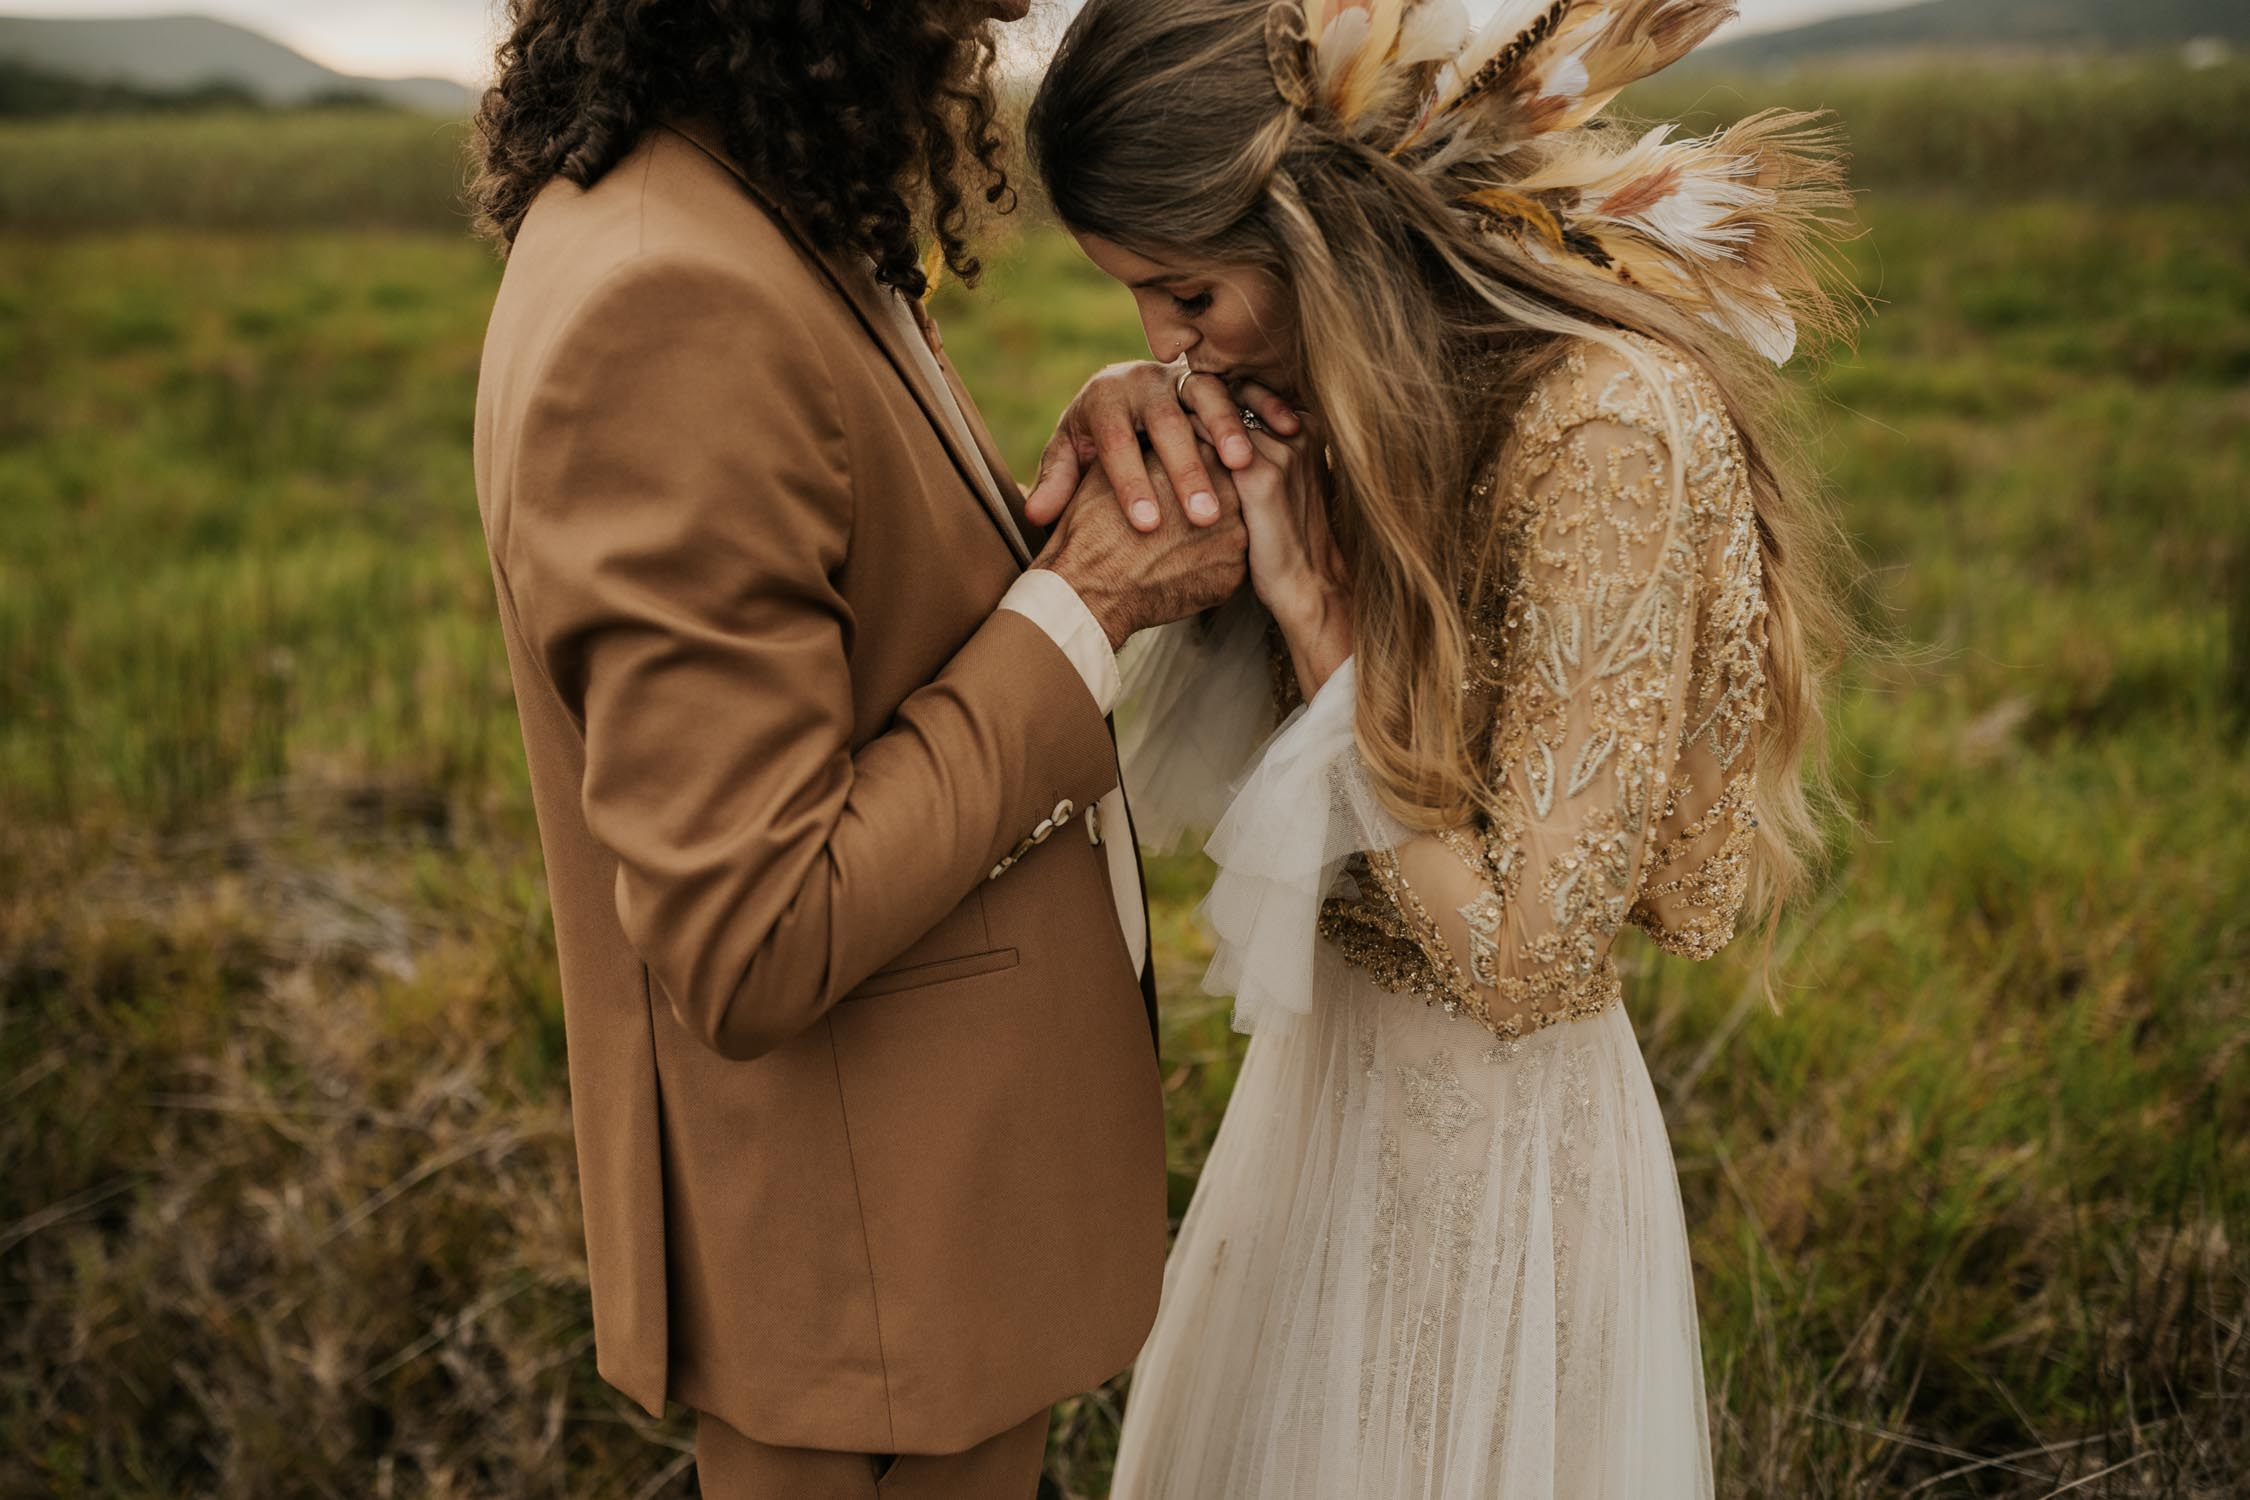 Intimate romantic candid Vancouver Wedding Photographer